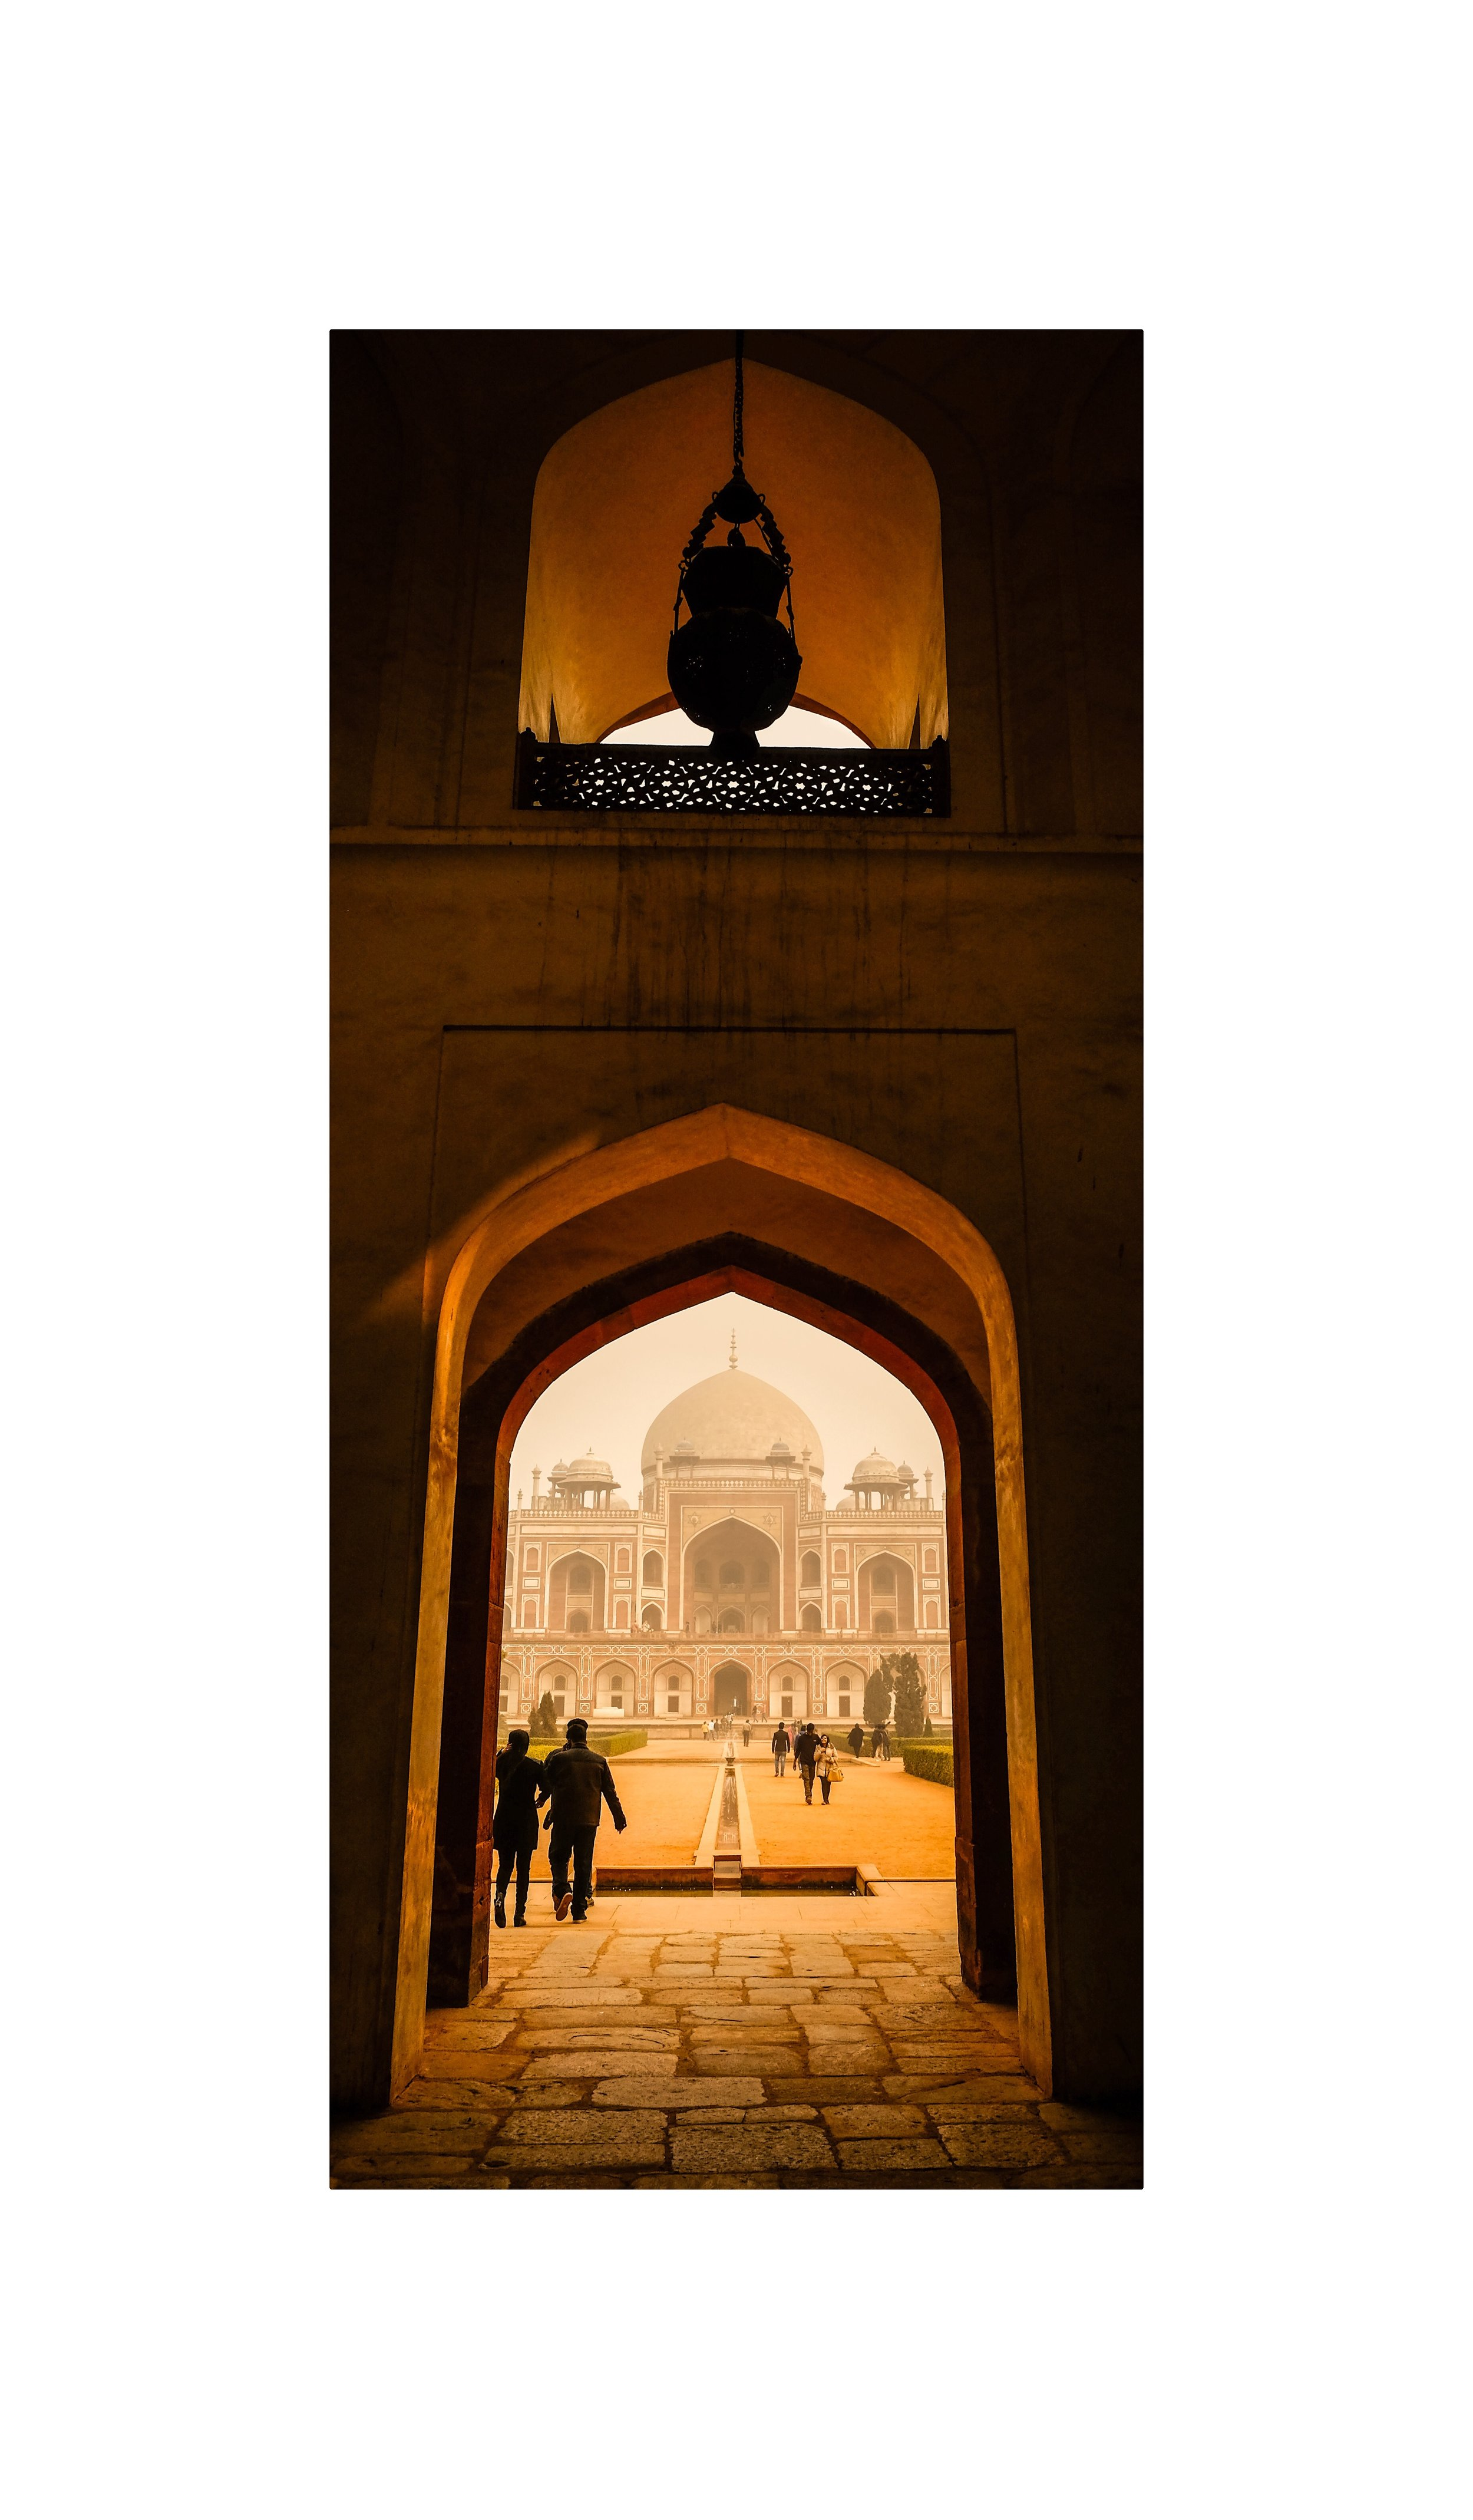 Humayun's Arches